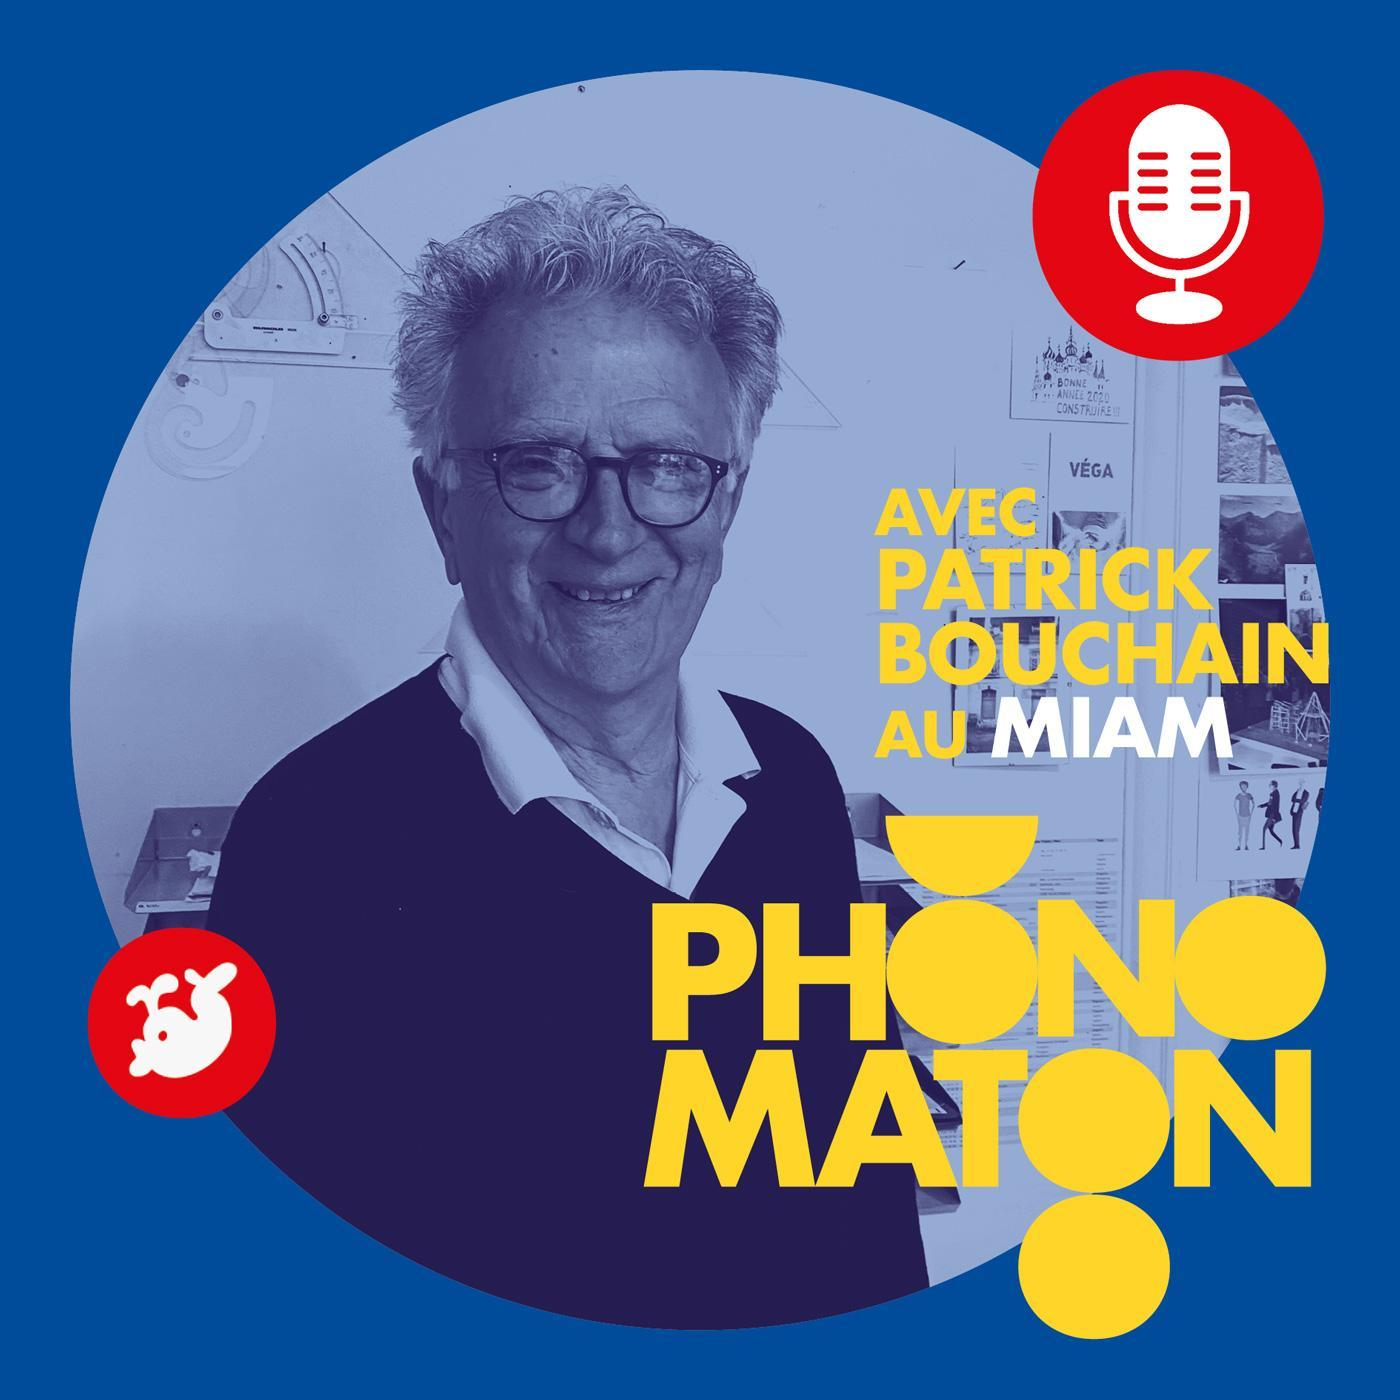 Phonomaton avec Patrick Bouchain au MIAM